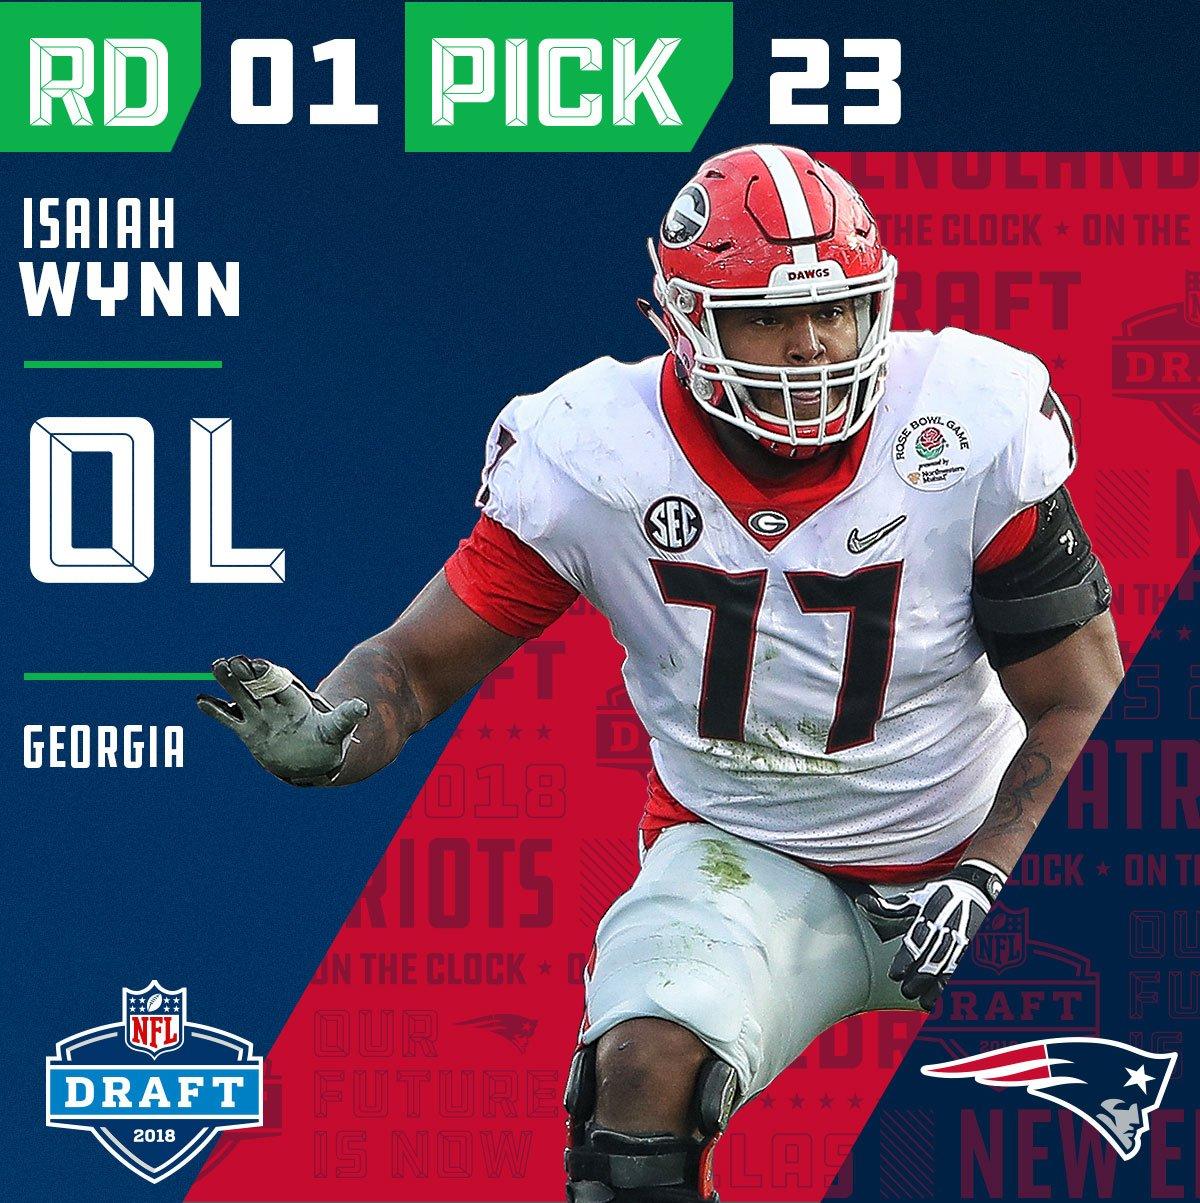 With the #23 overall pick in the 2018 #NFLDraft, the @Patriots select #IsaiahWynn (@iwynn77)!  ��: NFLN/FOX/ESPN https://t.co/JNiXESa33L